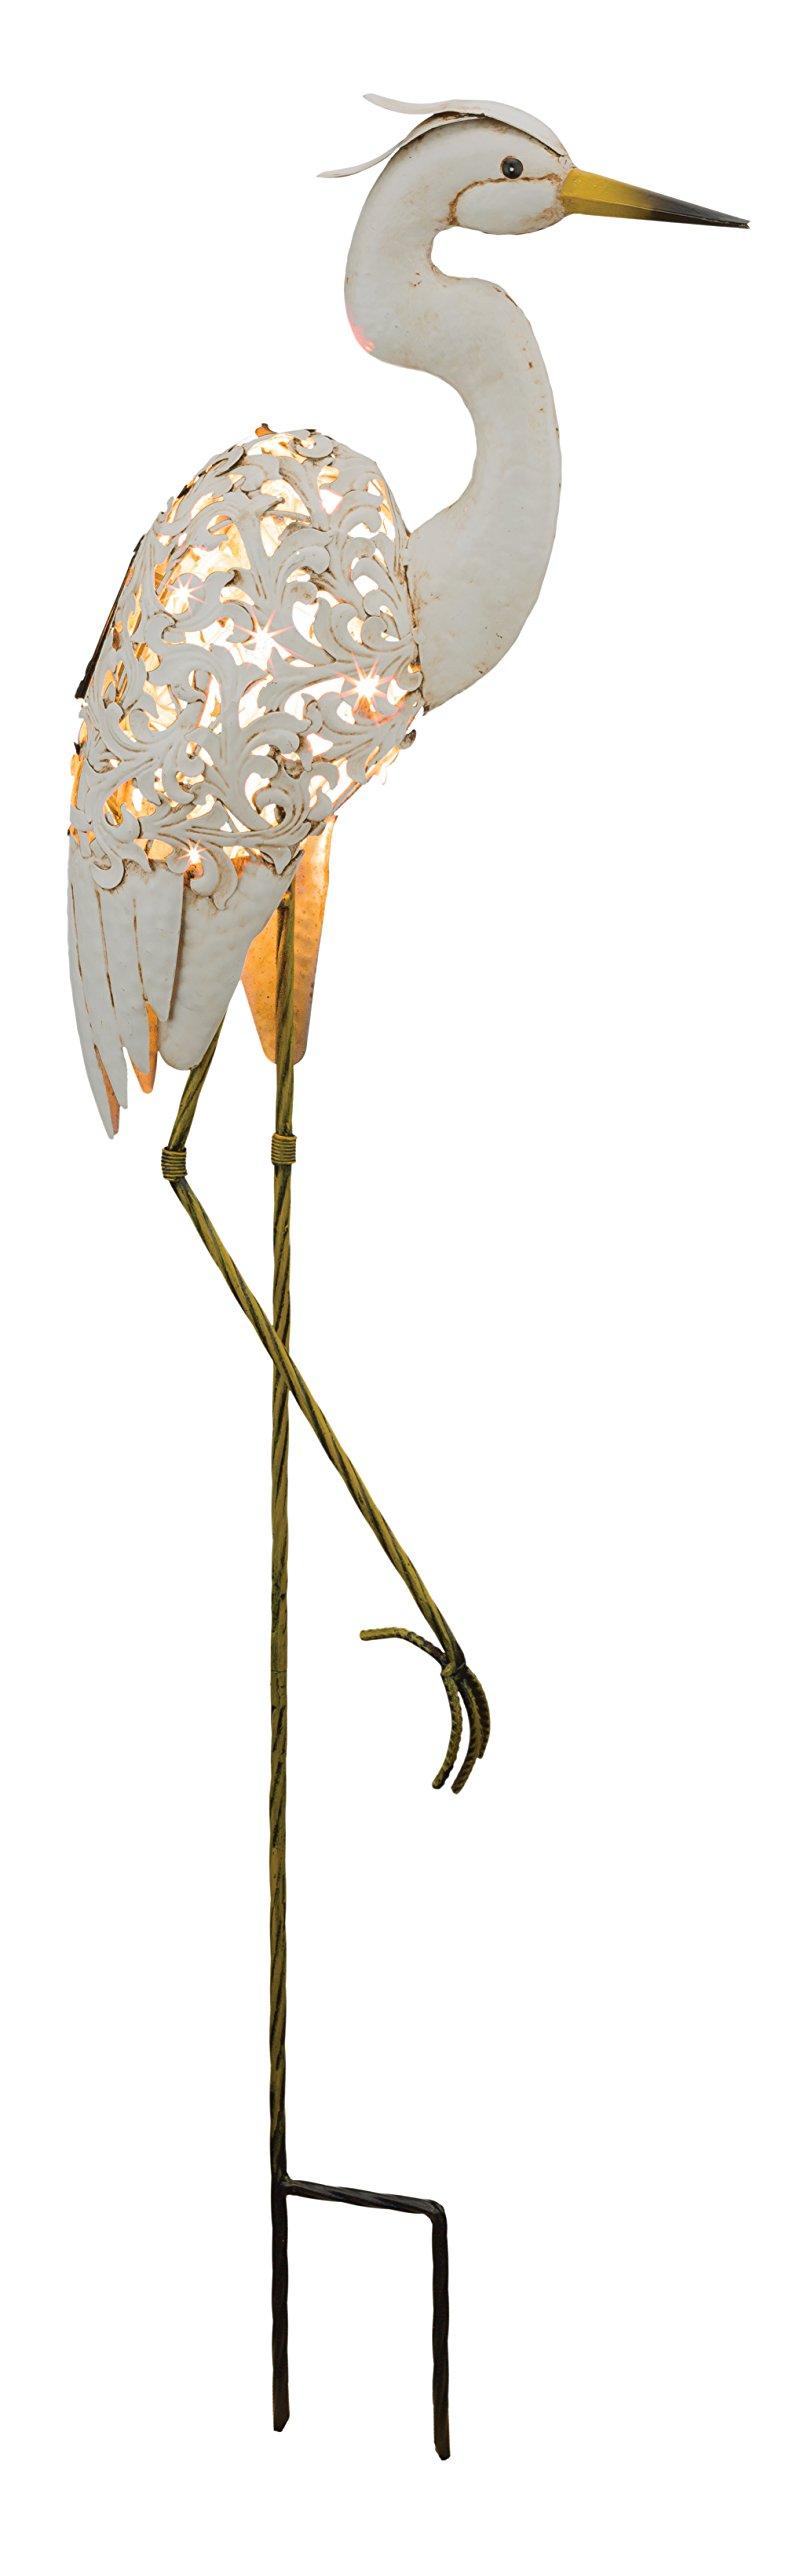 Regal Art & Gift Solar Bird Stake - Egret